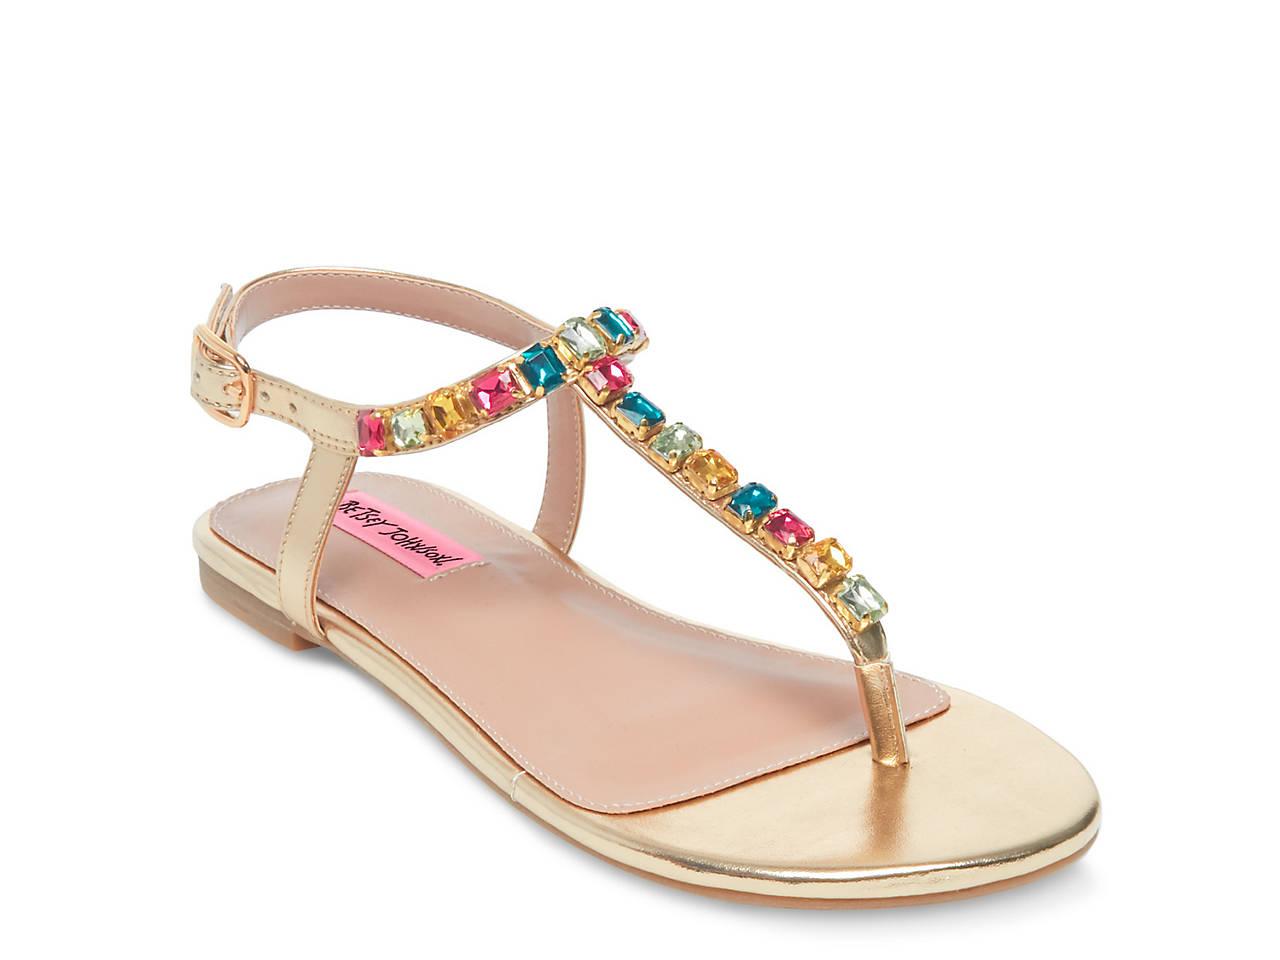 28302ef99bd6c4 Betsey Johnson Rome Sandal Women s Shoes